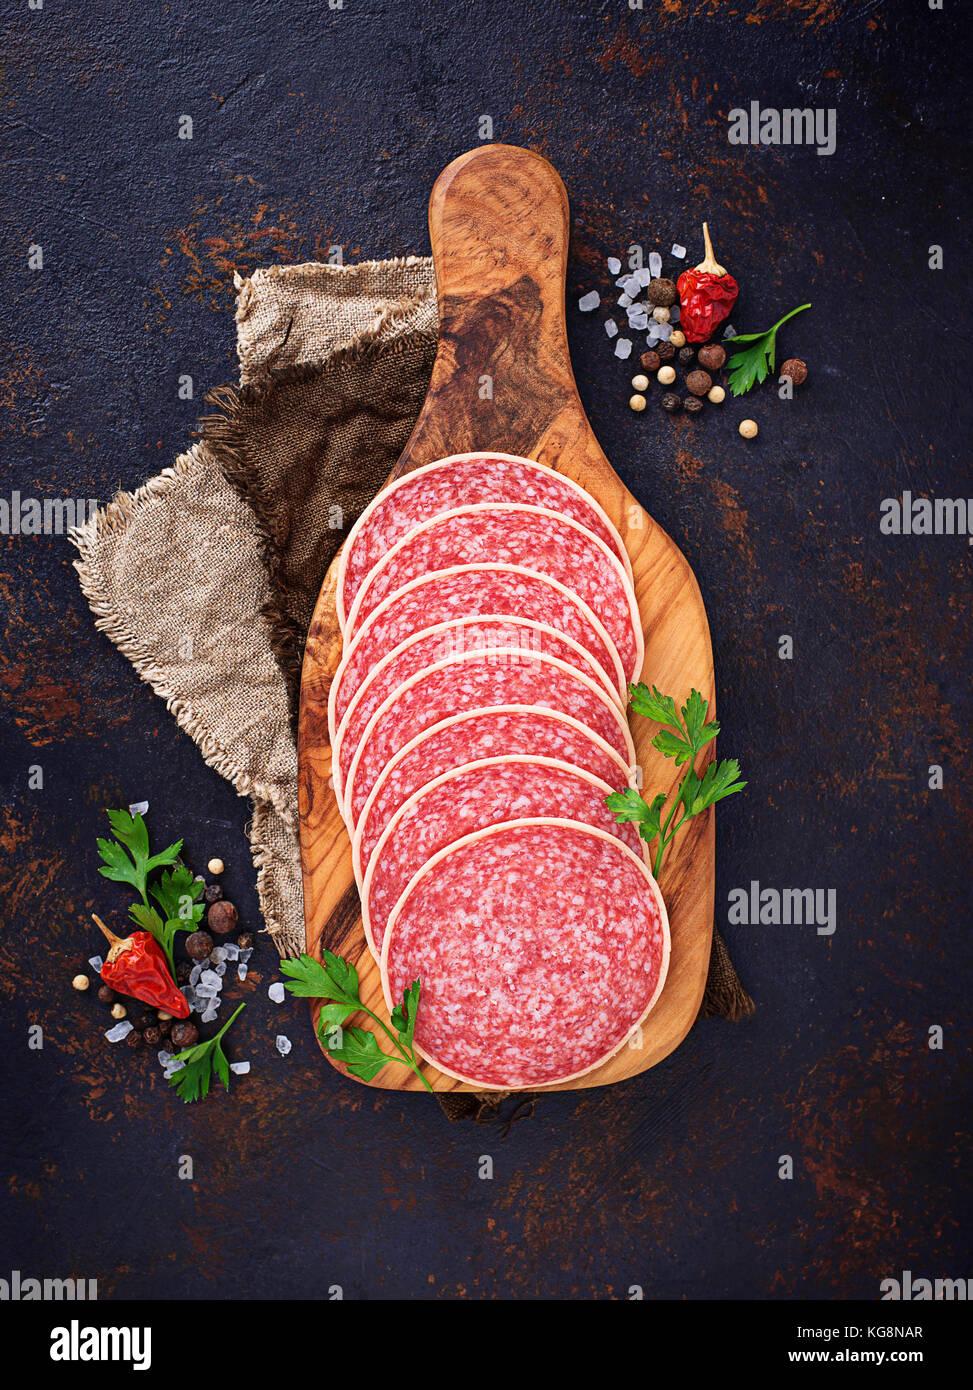 Italienische Salami Wurst auf Holzbrett. Stockbild